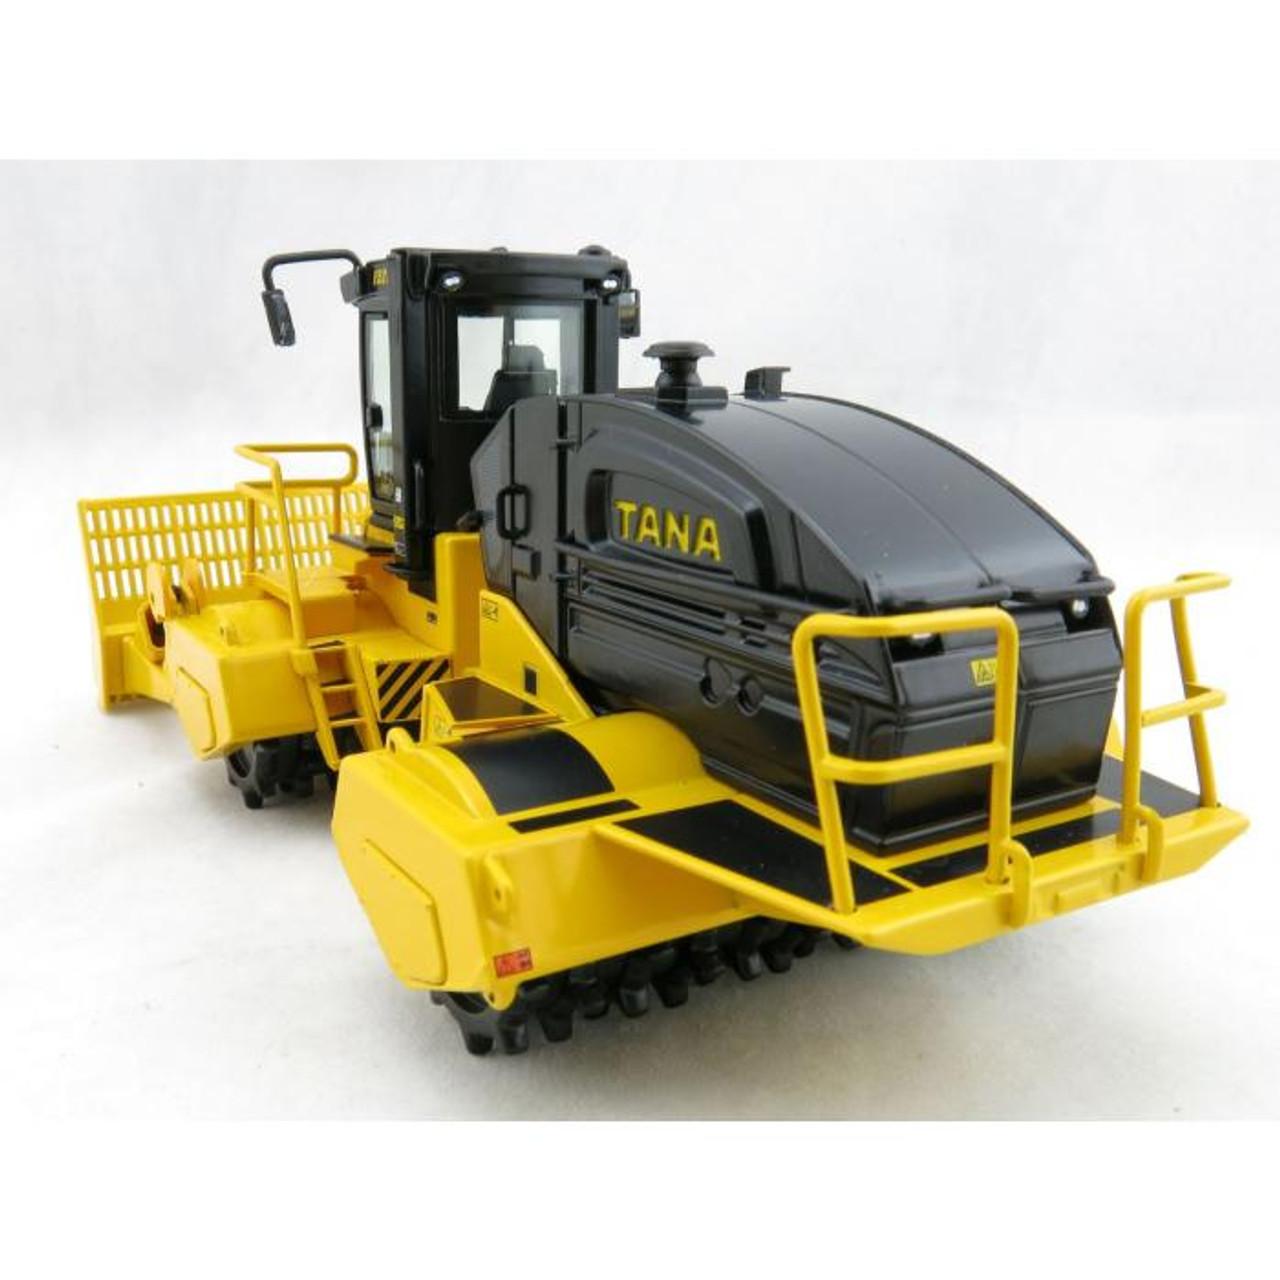 NZG 1:50 Tana E520 Landfill Compactor